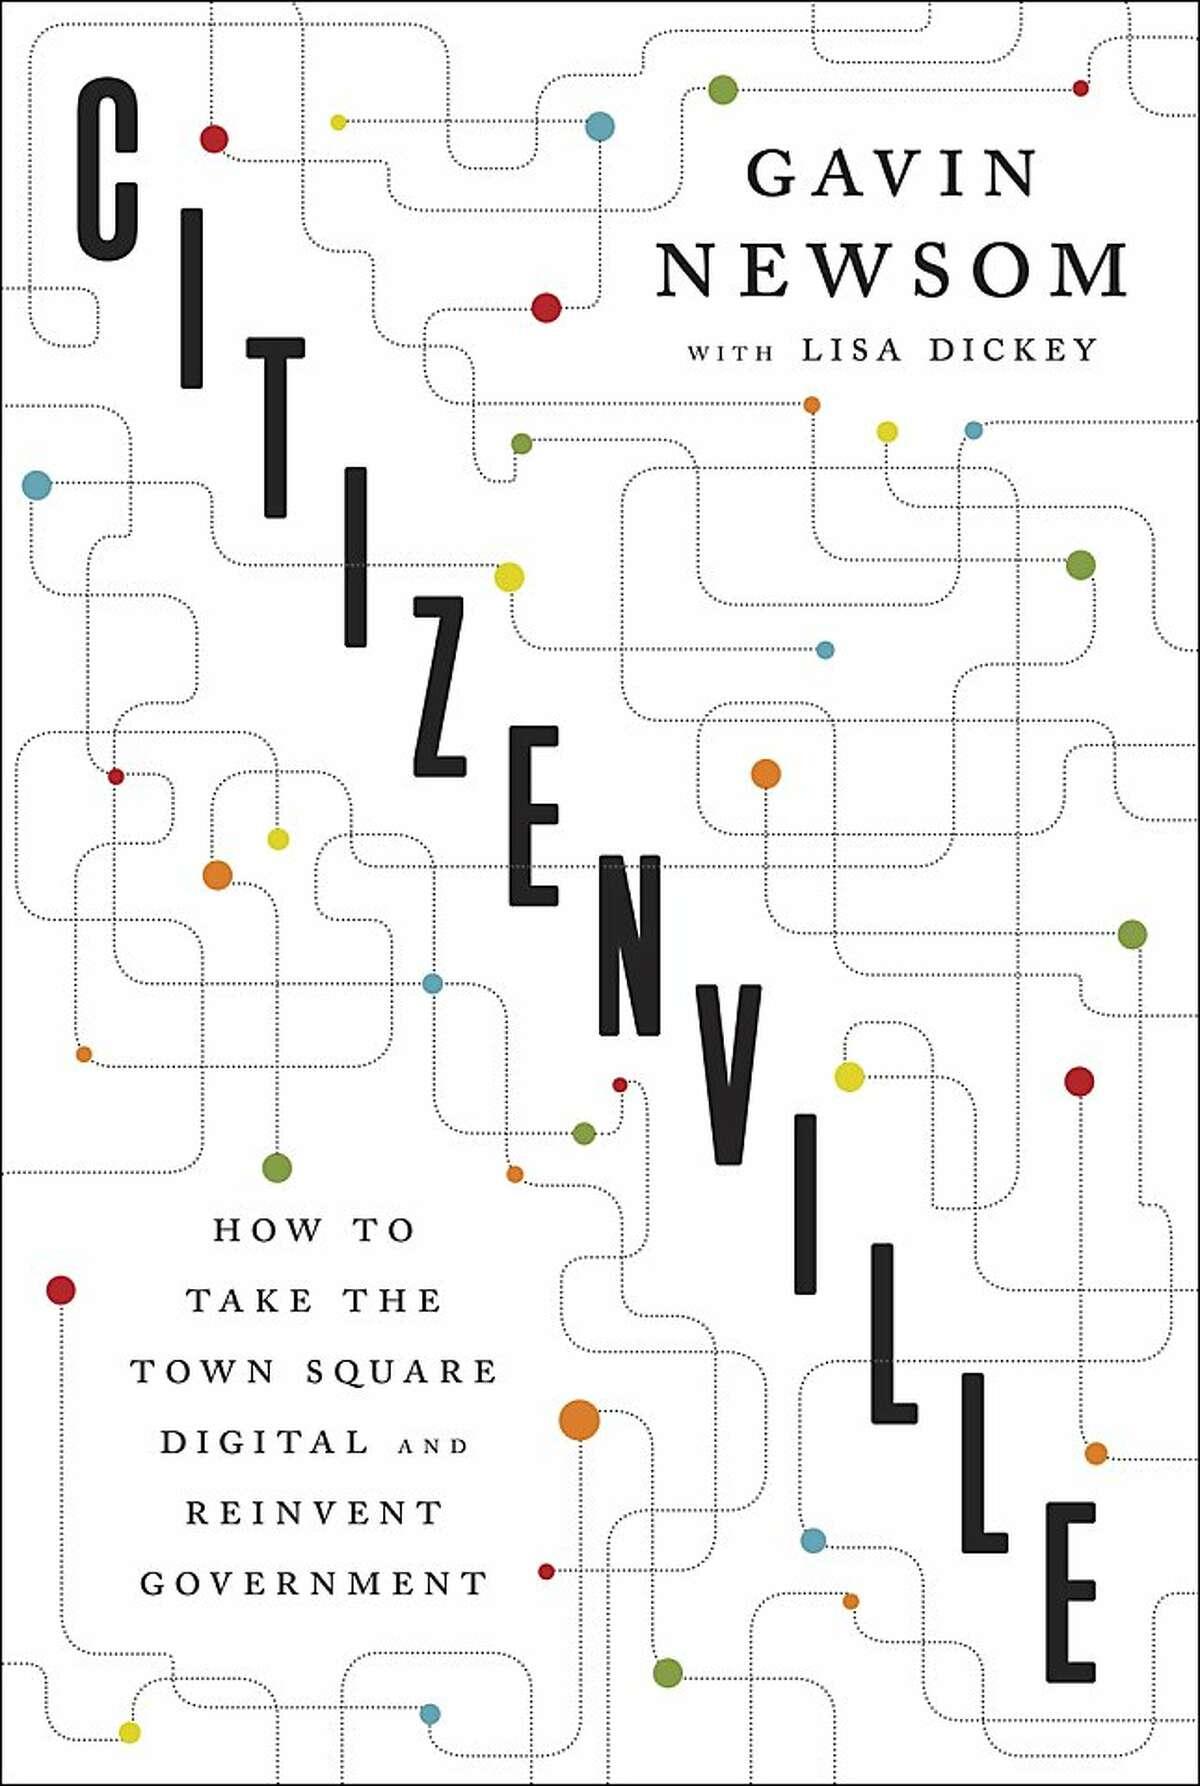 Citizenville, by Gavin Newsom with Lisa Dickey